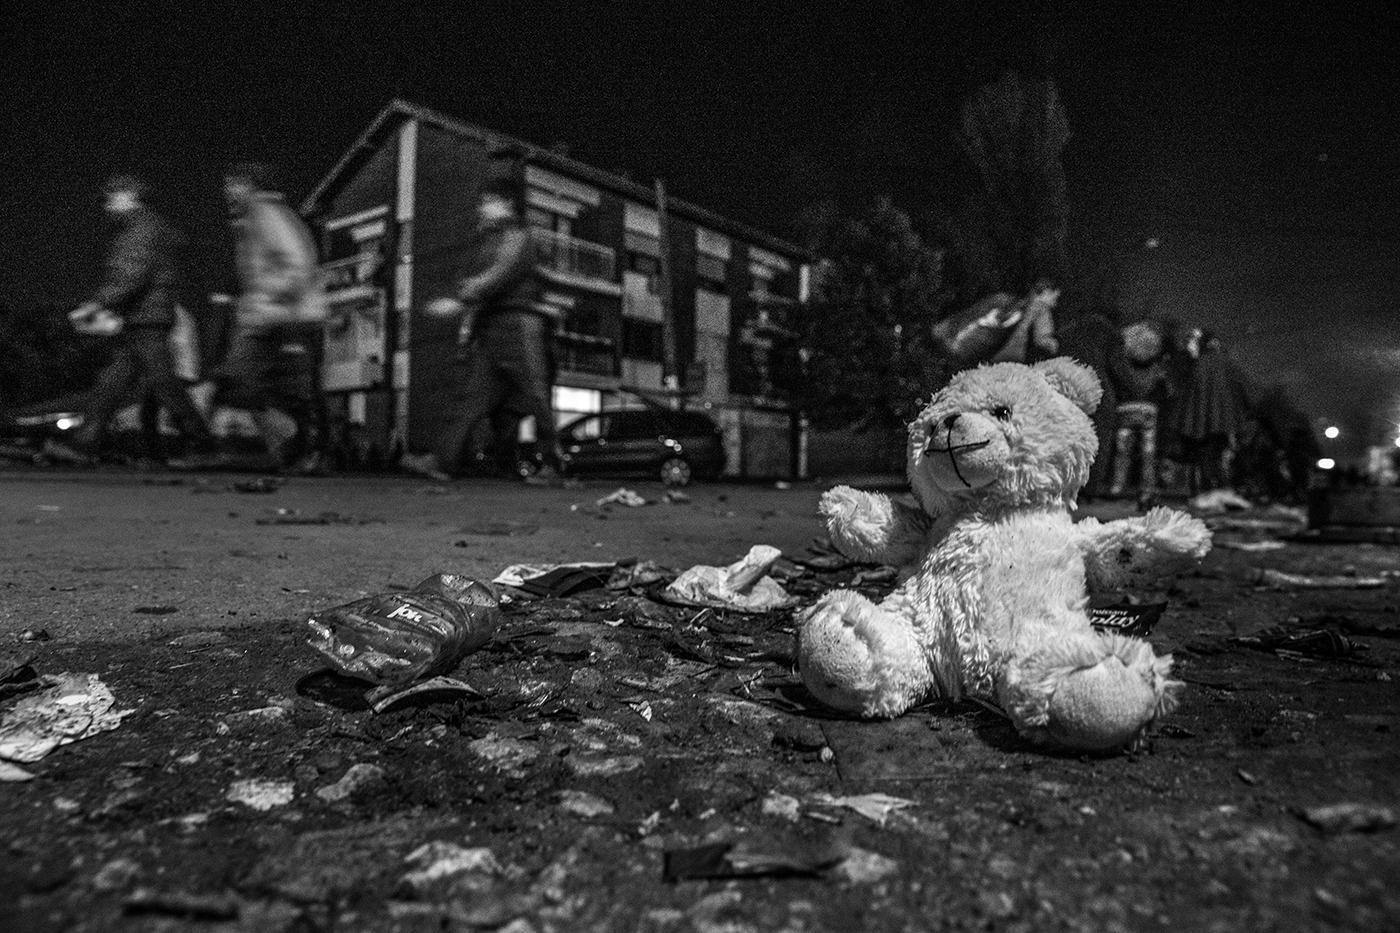 Christoph Jorda_Europe or Death_Plastic bag full of hope_Germany_16.jpg